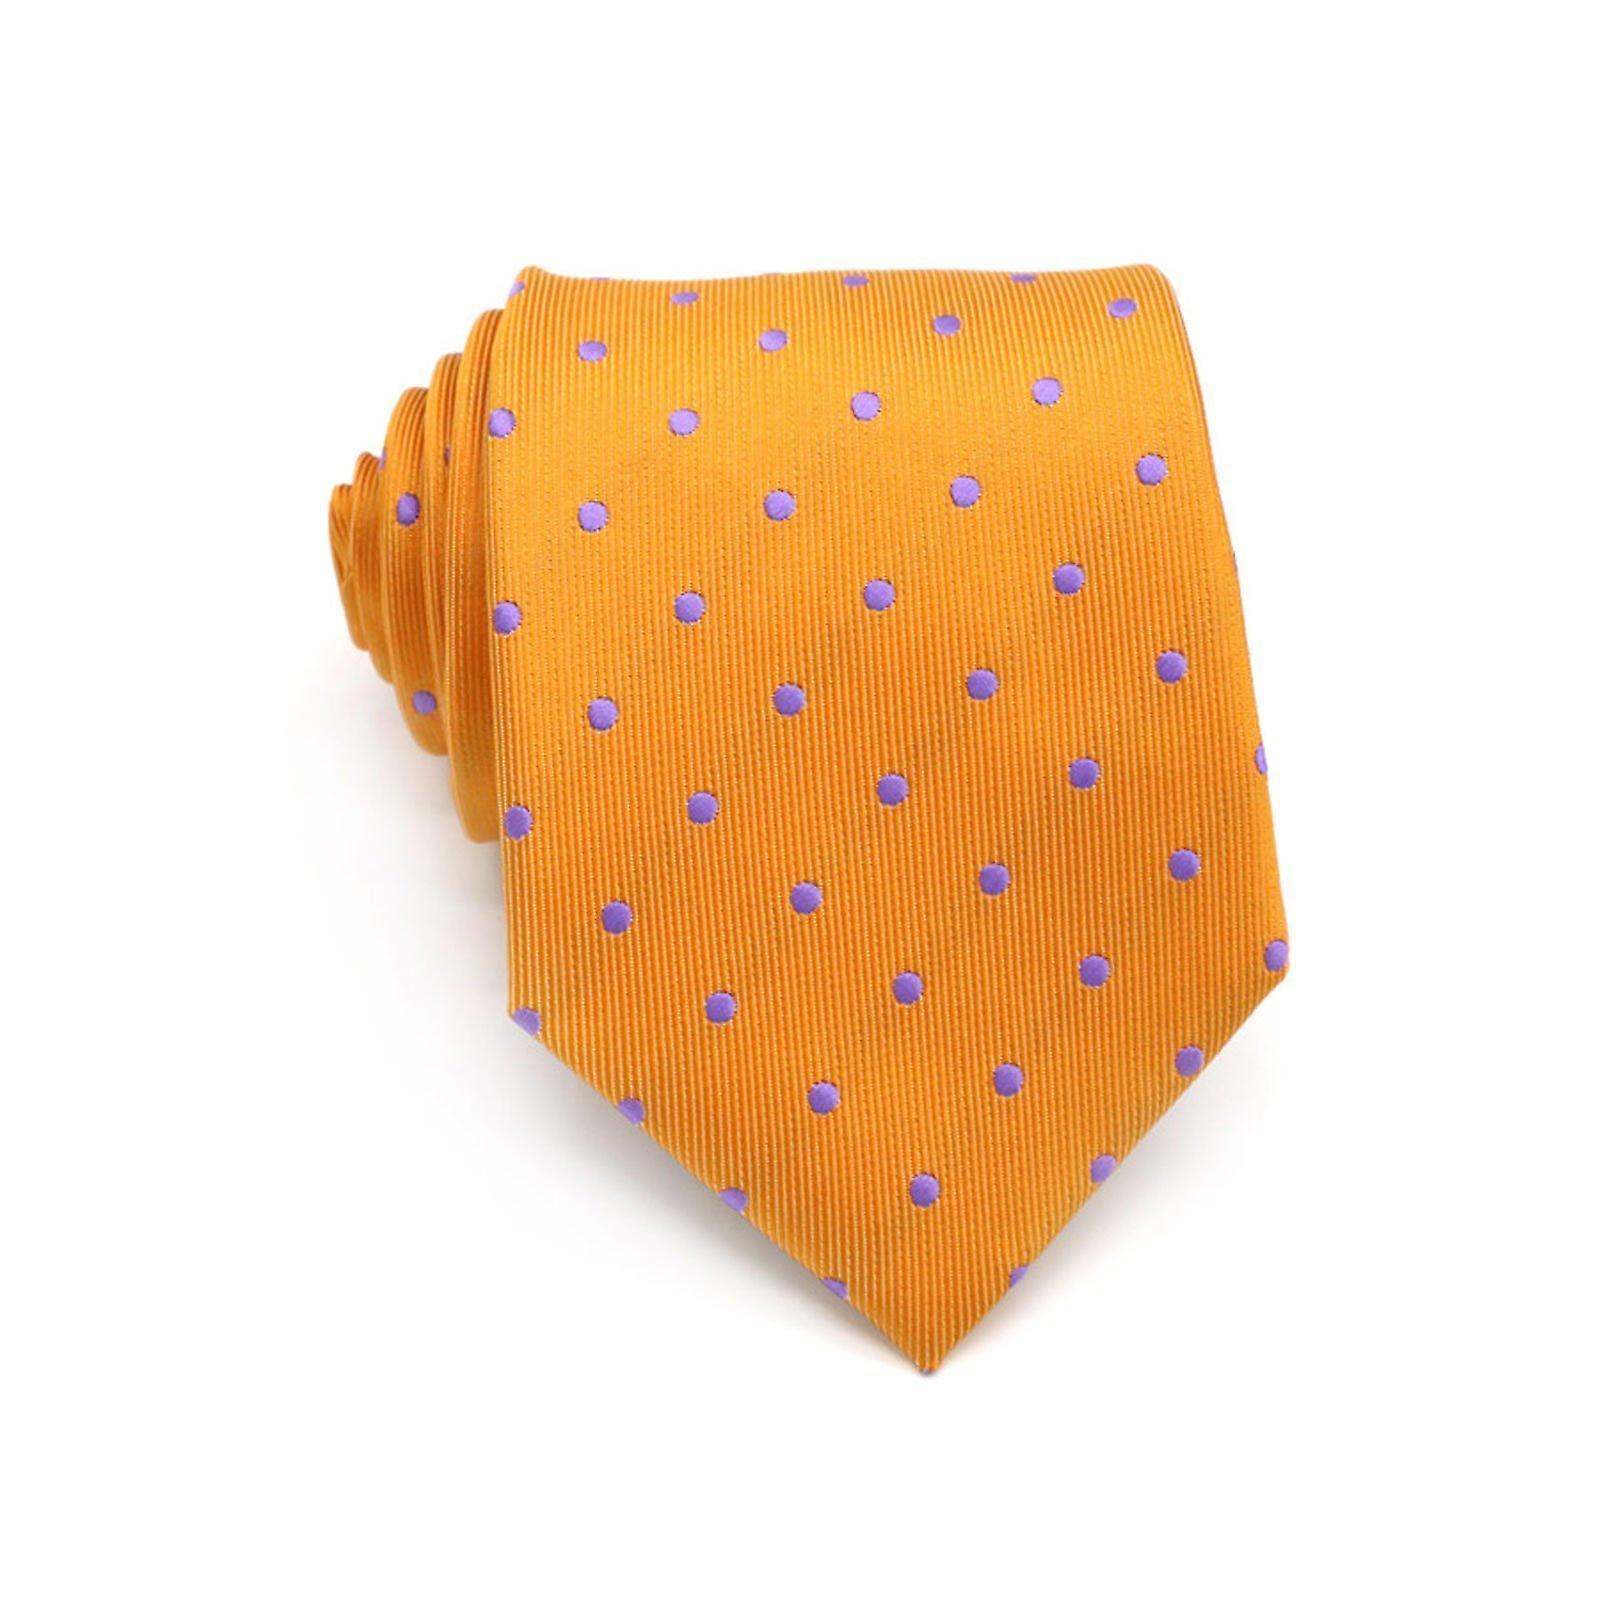 Orange & purple polka dot necktie standard width tie